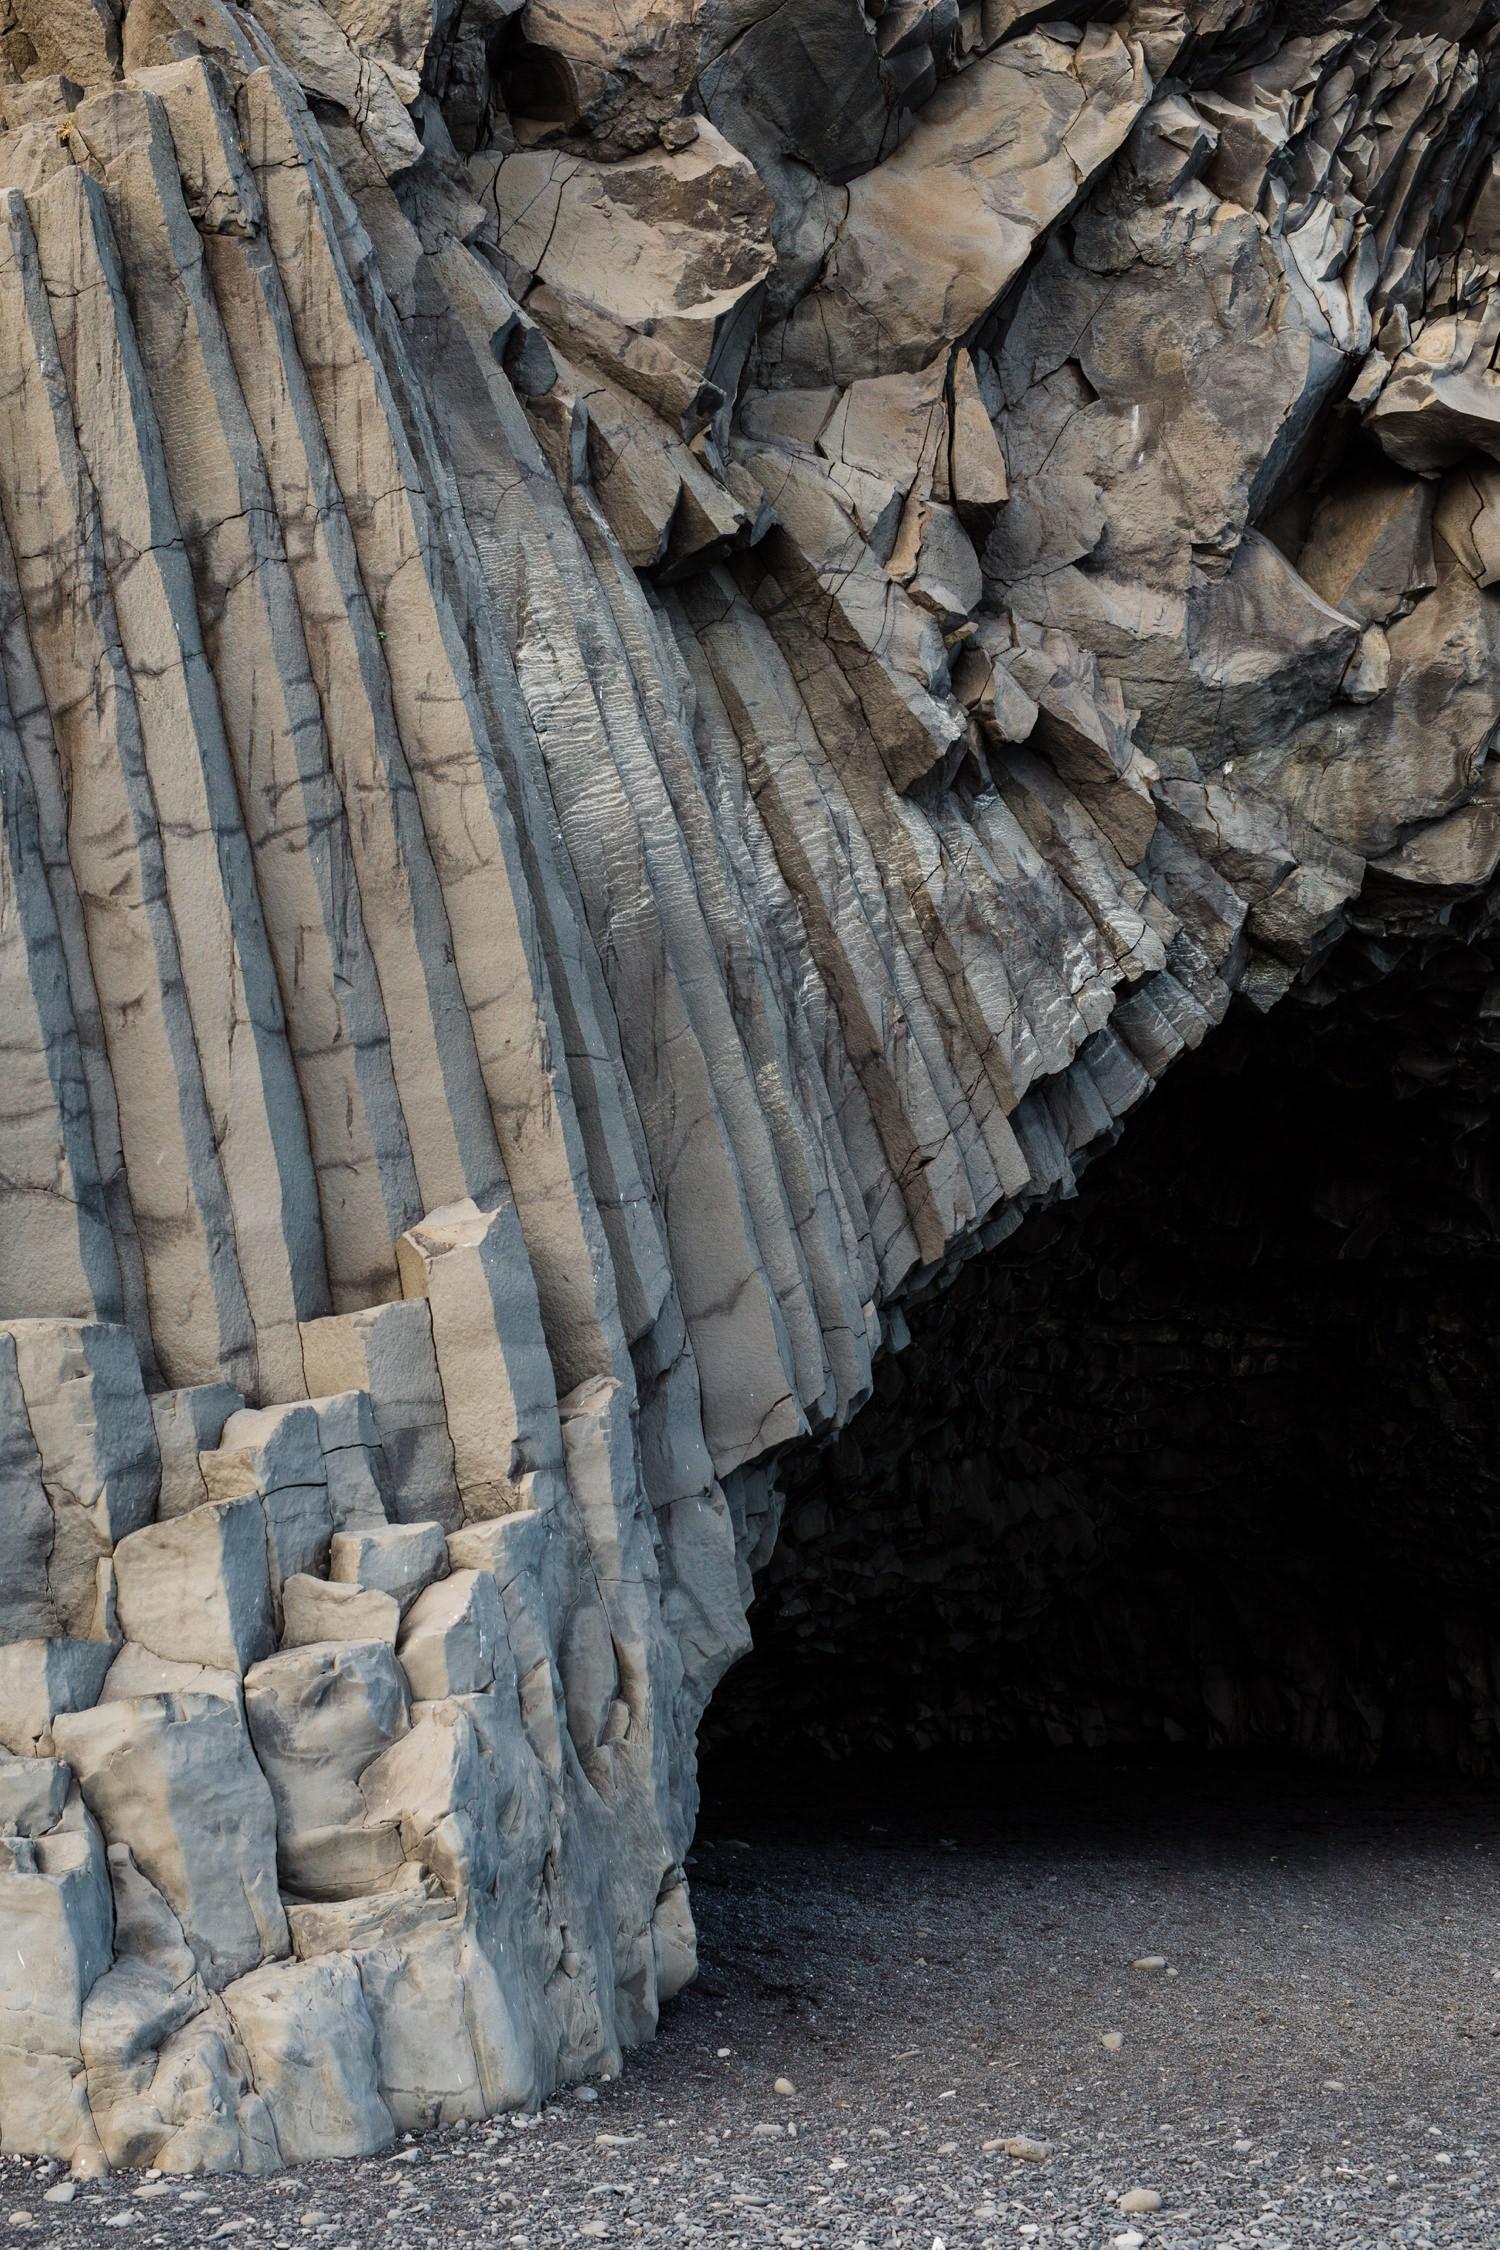 iceland-vik-beach-basalt-cave-cameron-zegers.jpg